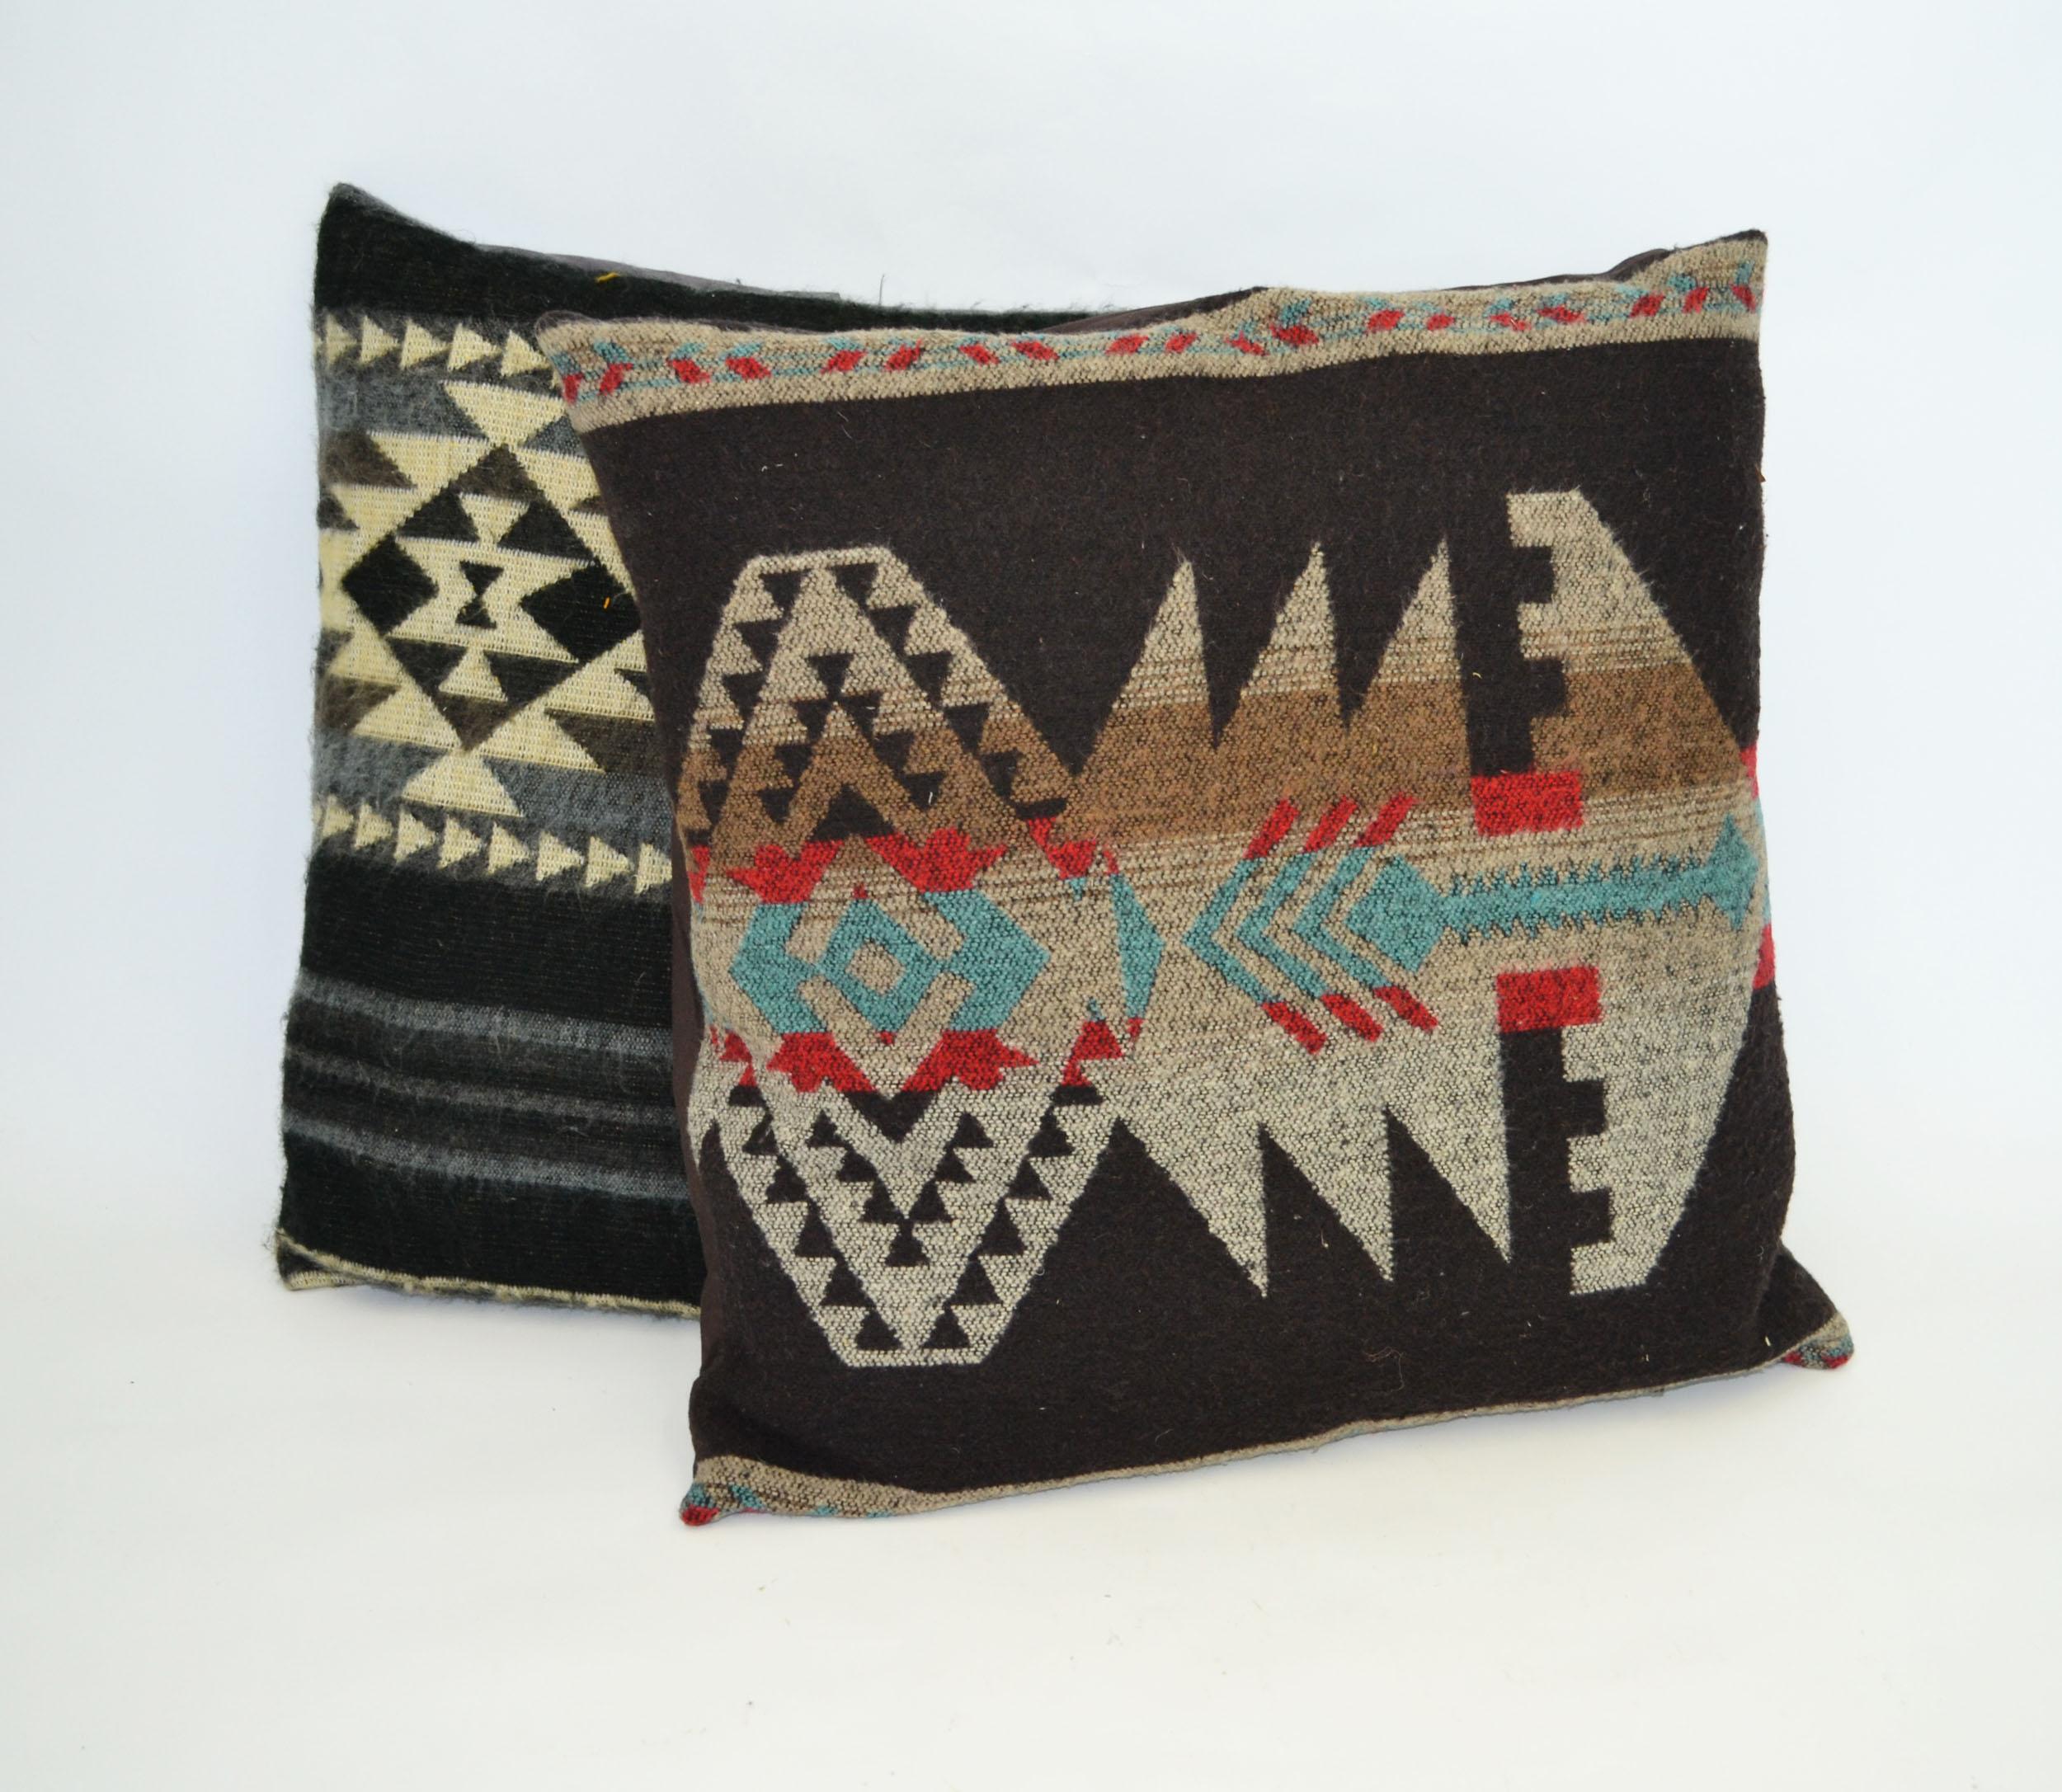 south western pillow - Dark   Quantity: 4  Price: $10.00